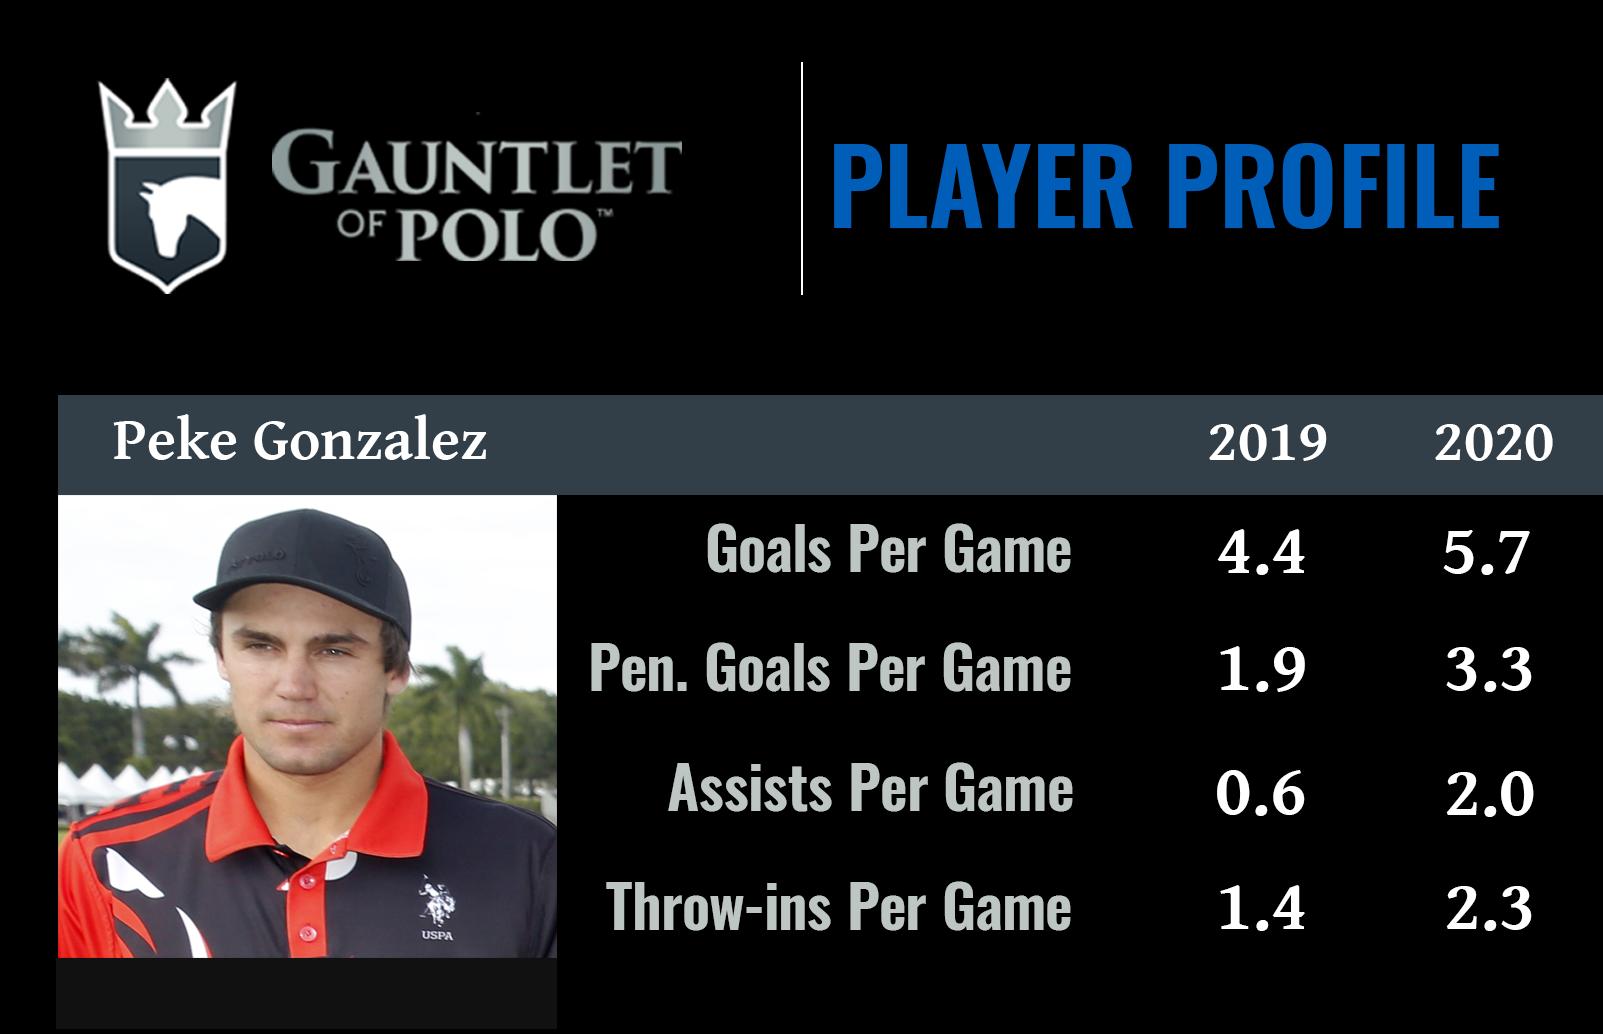 Peke Gonzalez